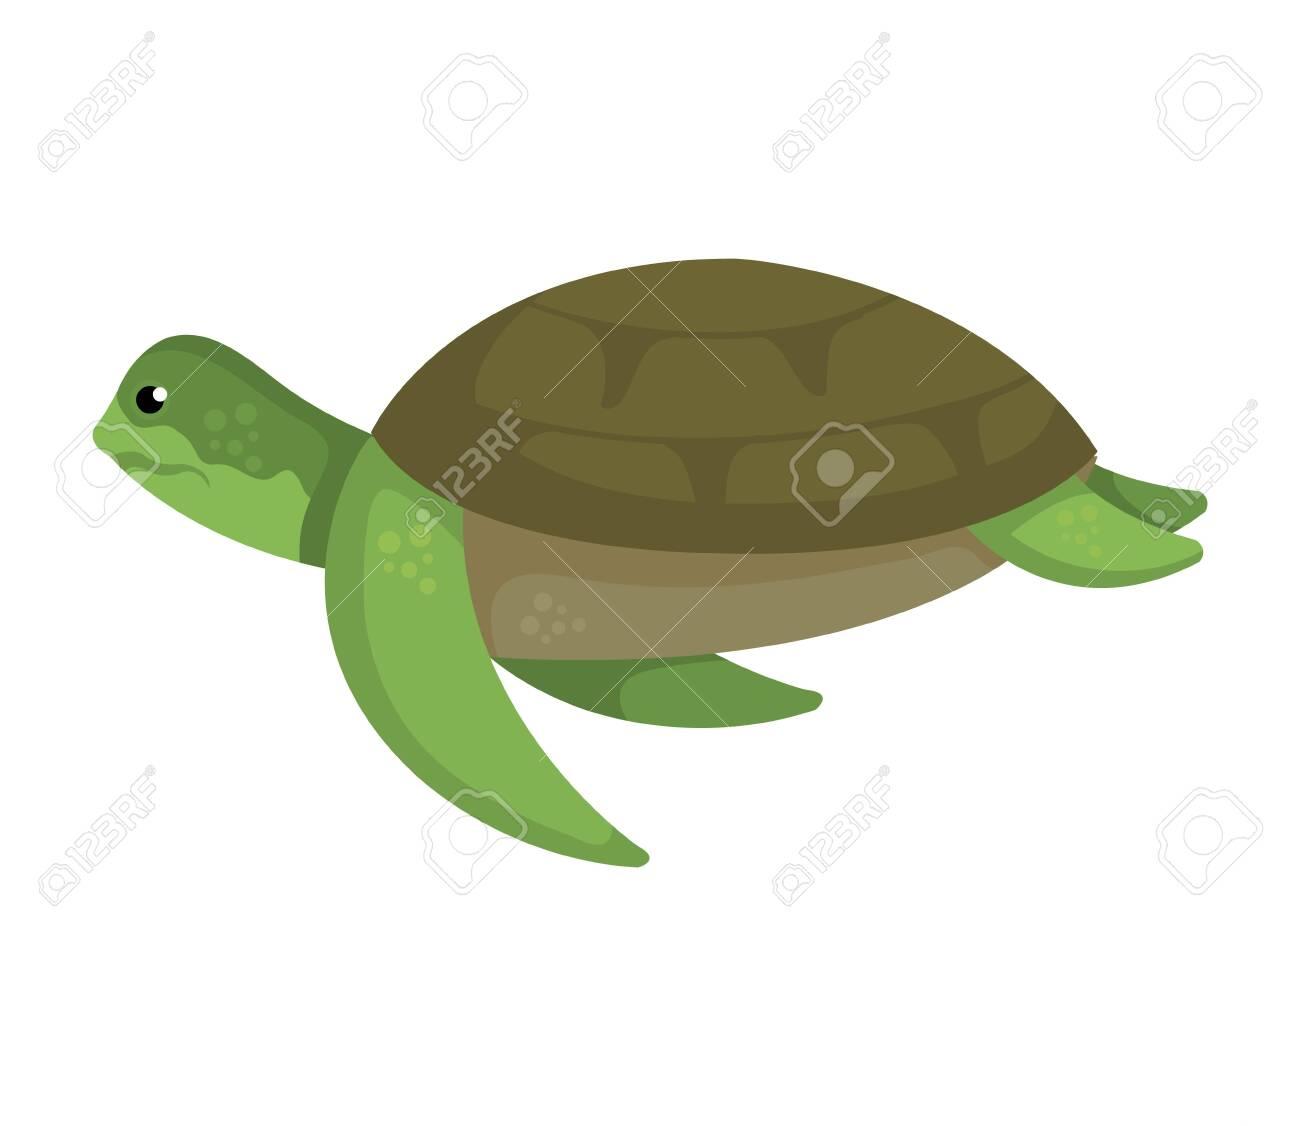 turtle animal nature icon vector illustration design - 124992219